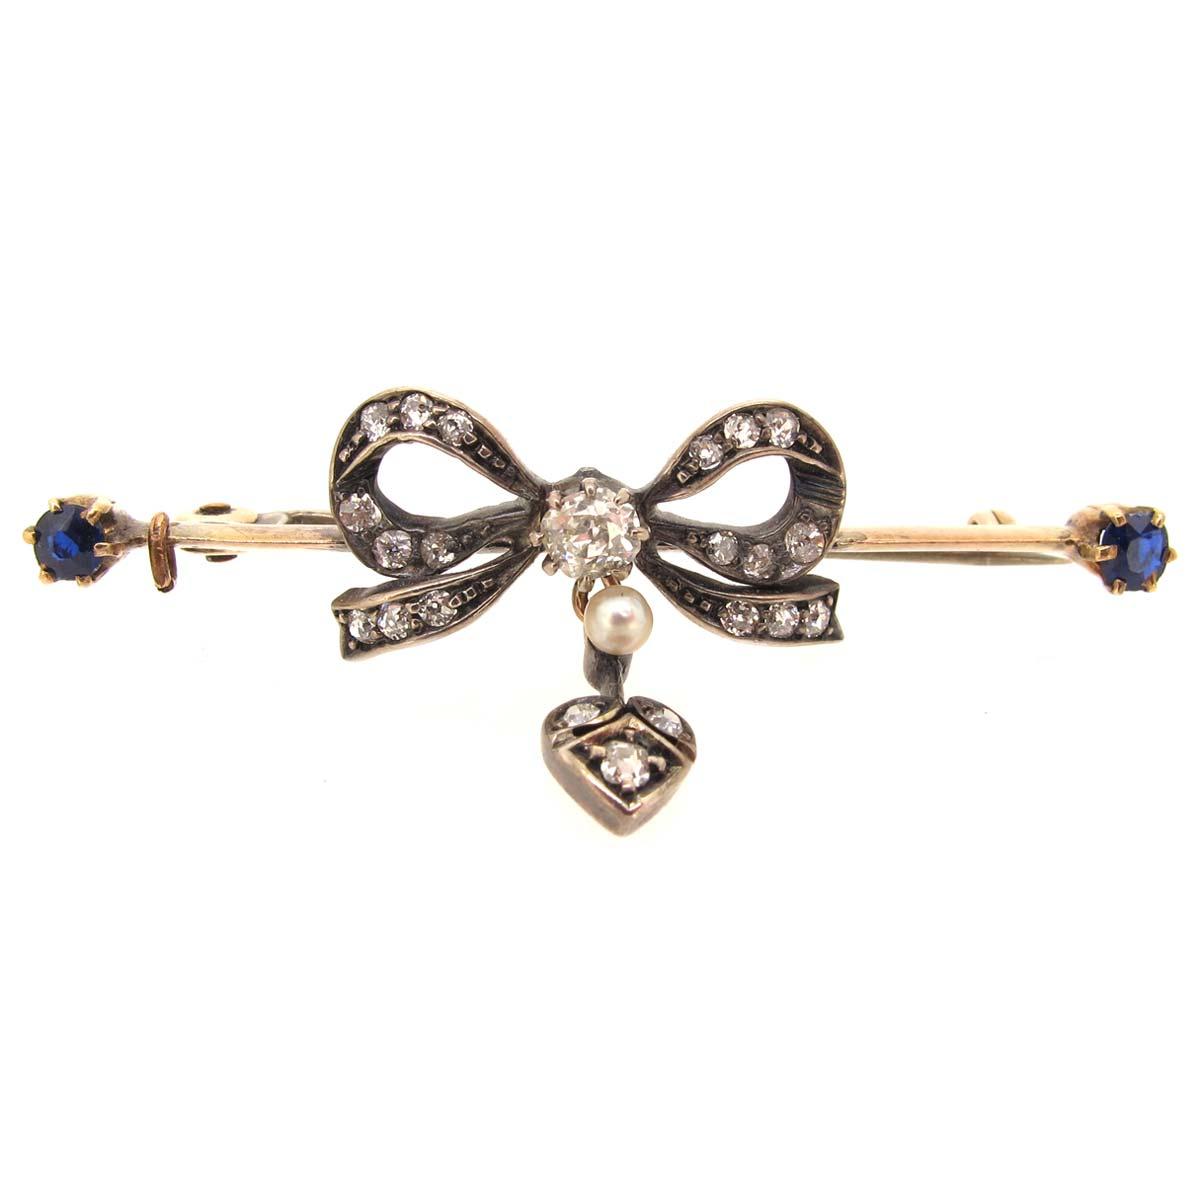 Antique diamond, sapphire & pearl brooch